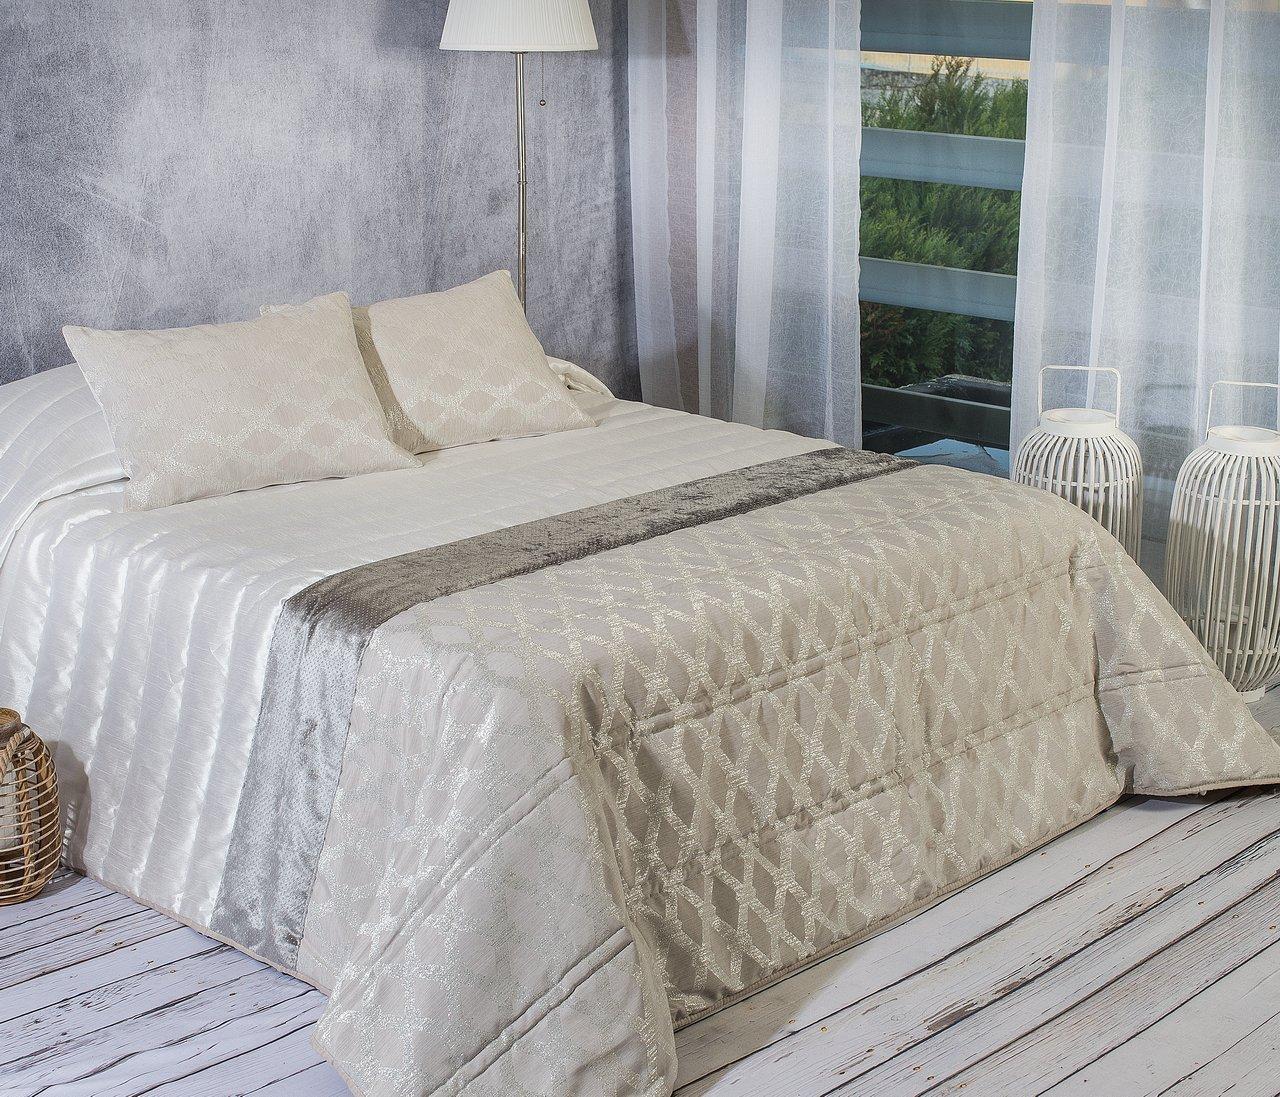 Algodón Weiß Baumwolle Weiß Cascavel Tagesdecke Bouti, 1 Kissenbezug, Jacquard, 60 x 40 cm 180 x 270 cm; 60 x 40 cm grau